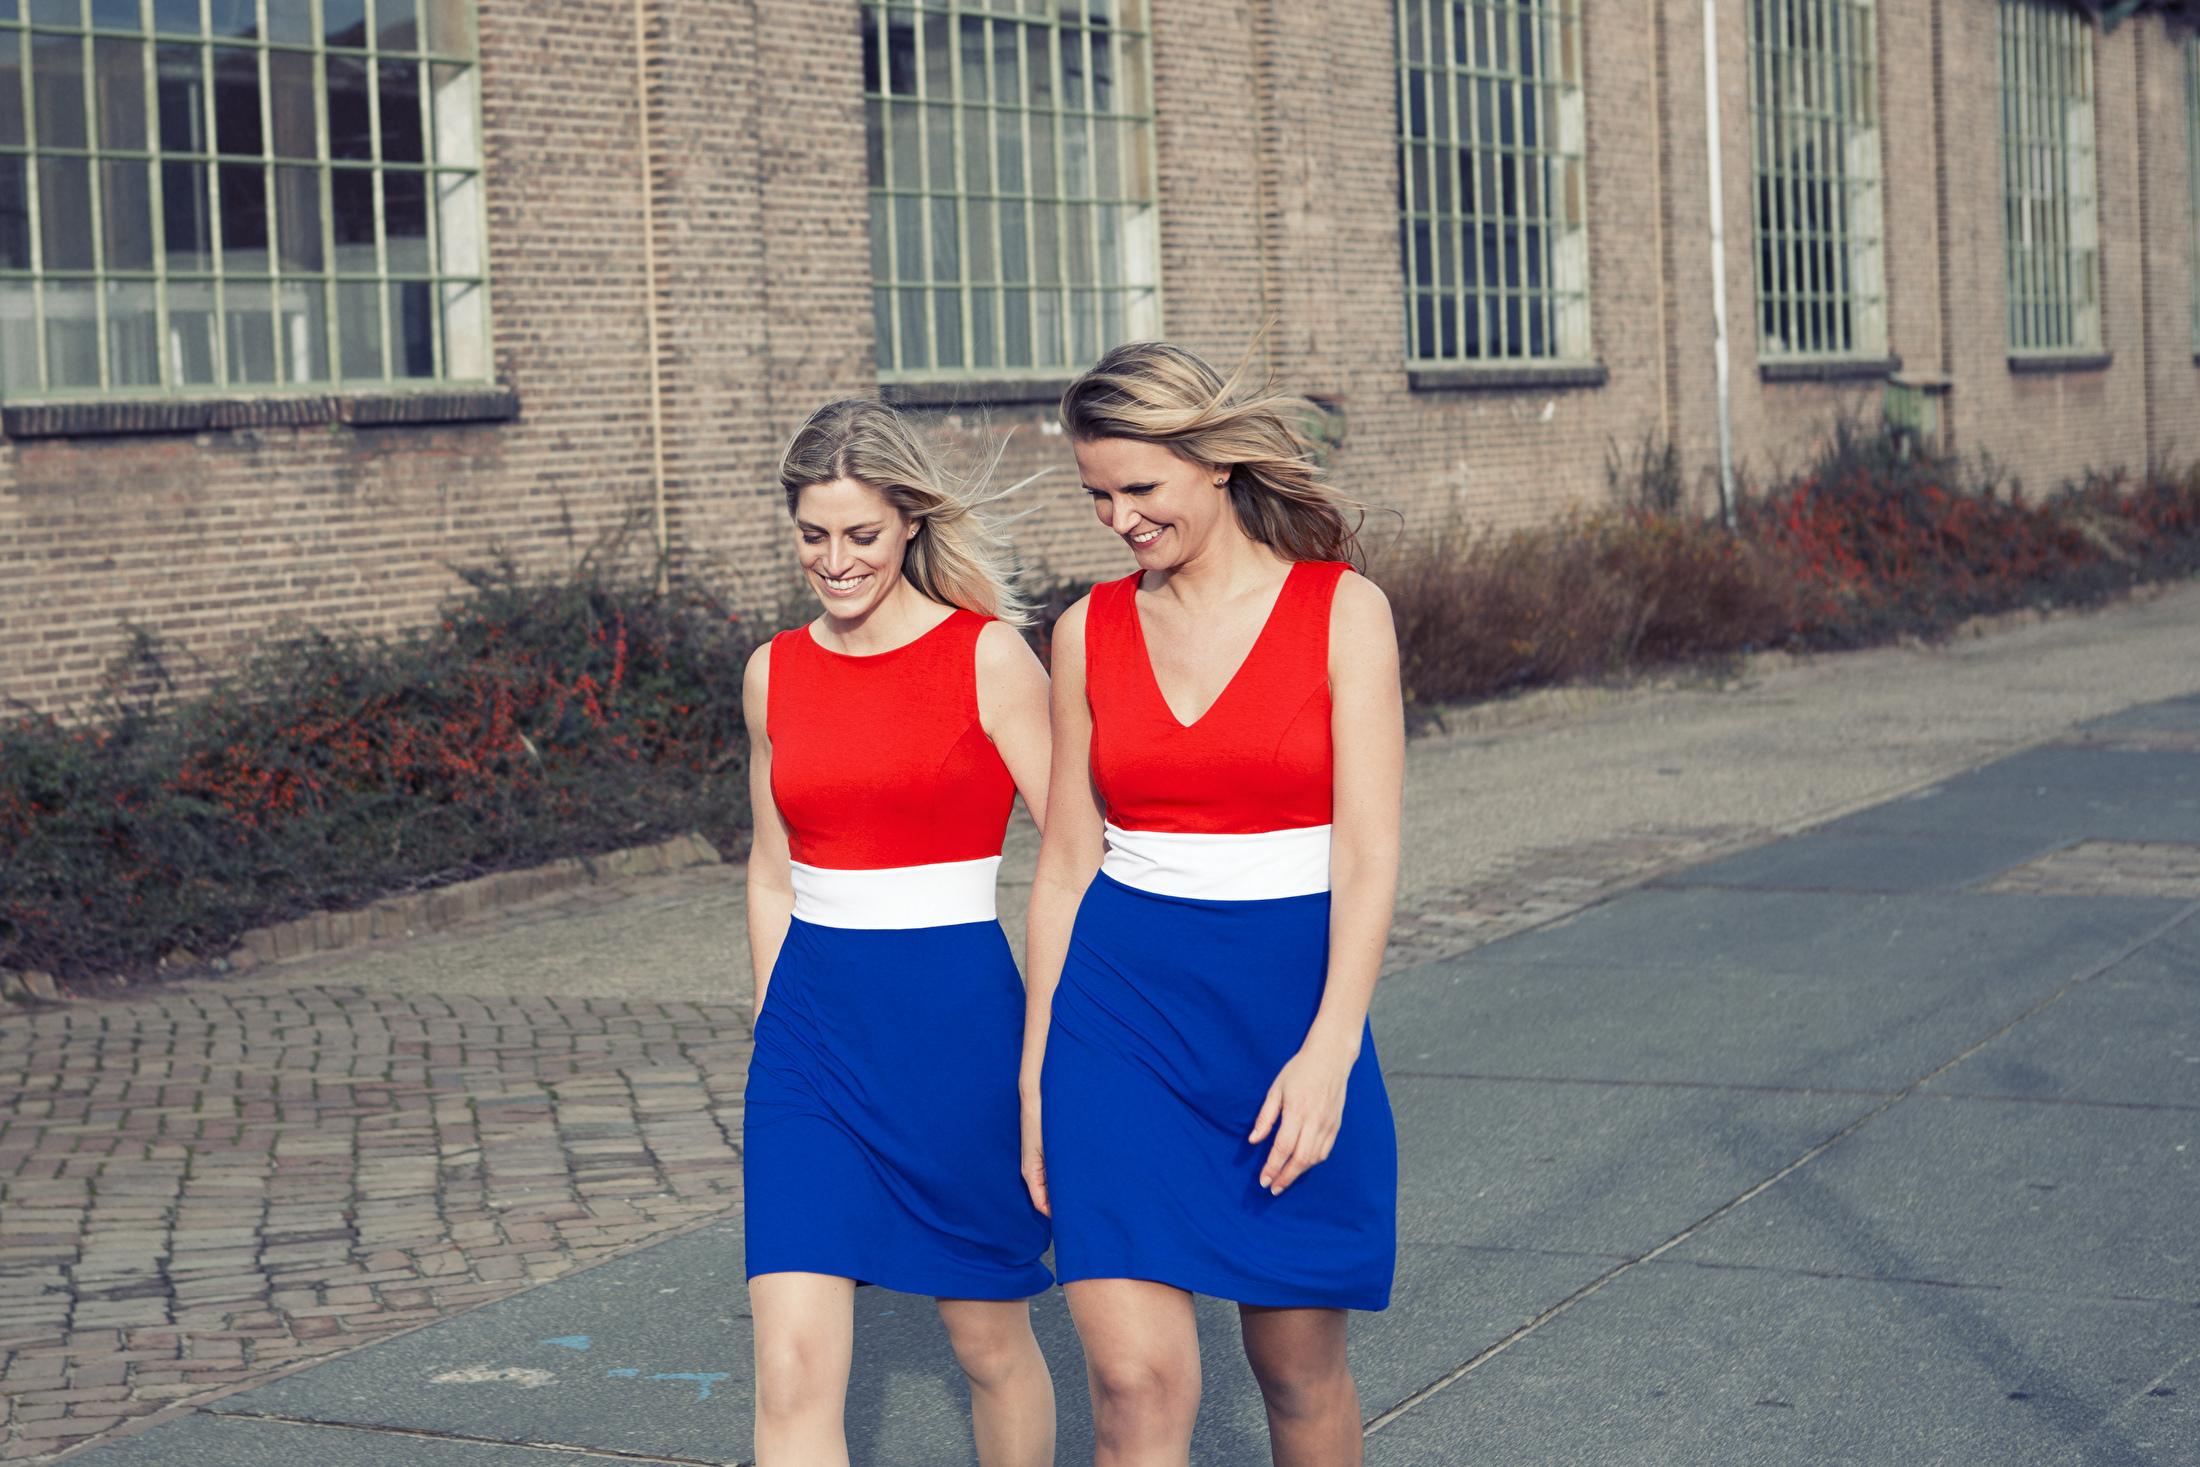 vlaggenjurk oranje wk voetbal songfestival rood wit blauw